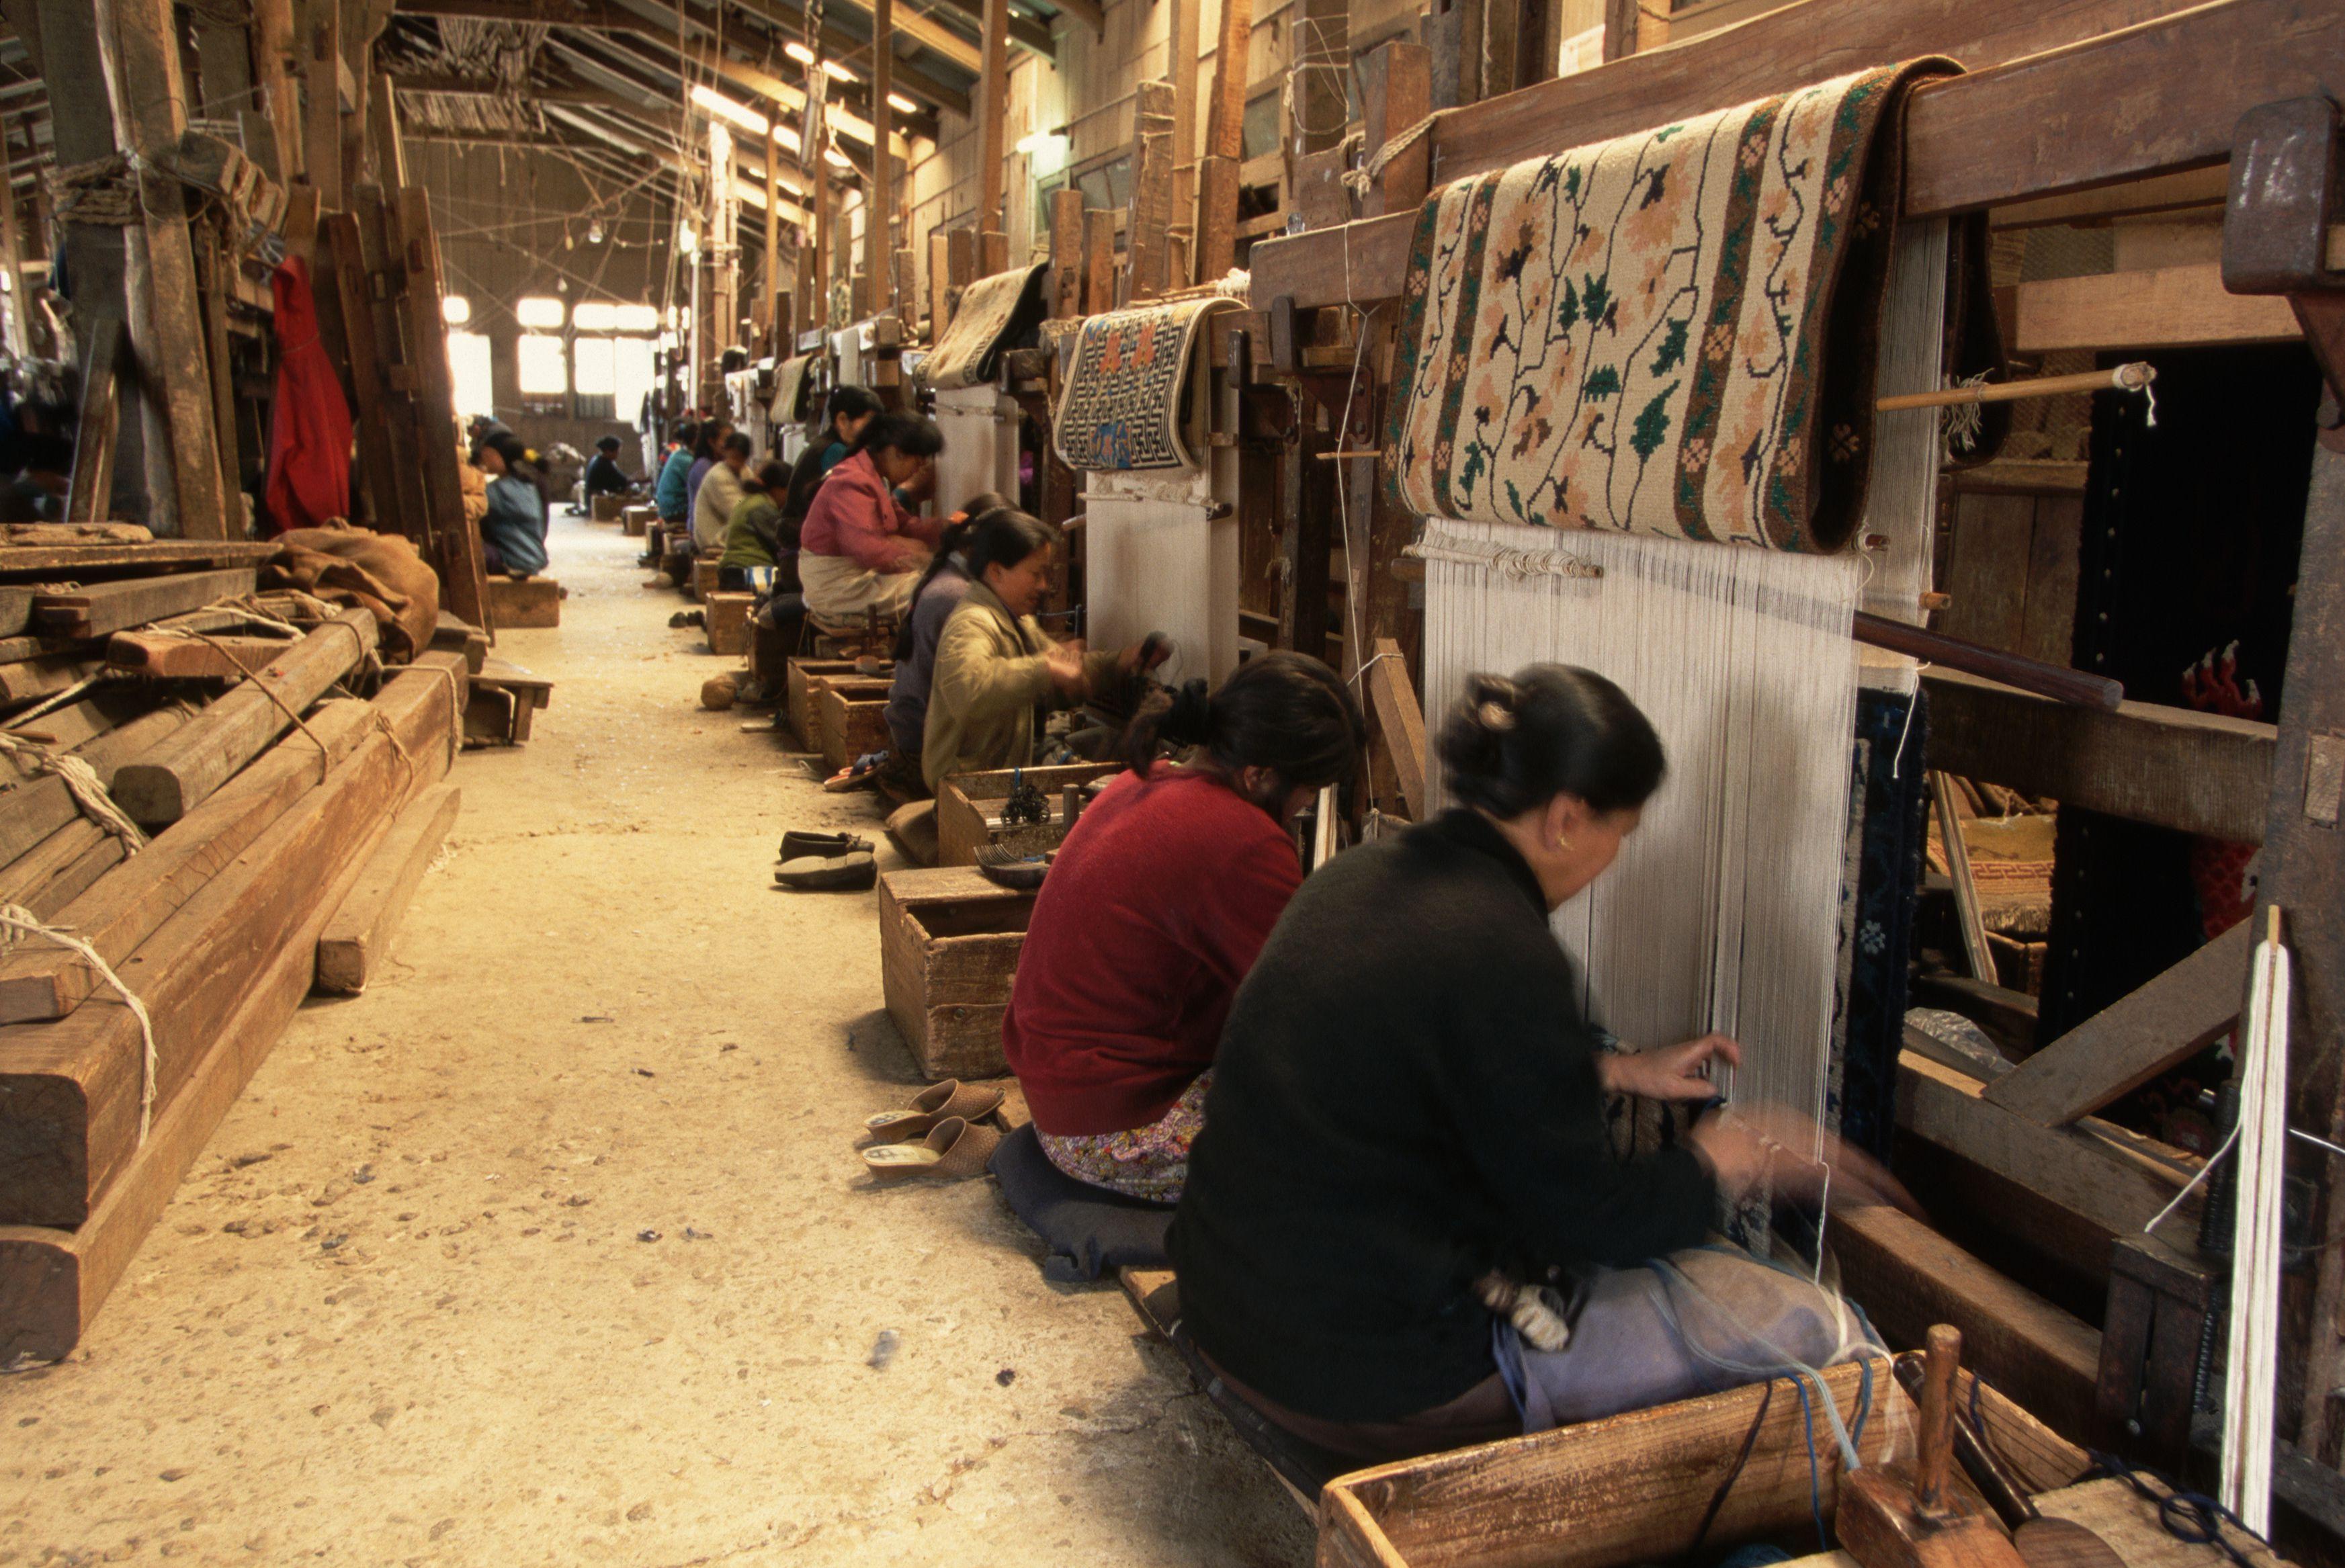 Tibetan women weave carpets on looms at a Tibetan refugee camp in Darjeeling.